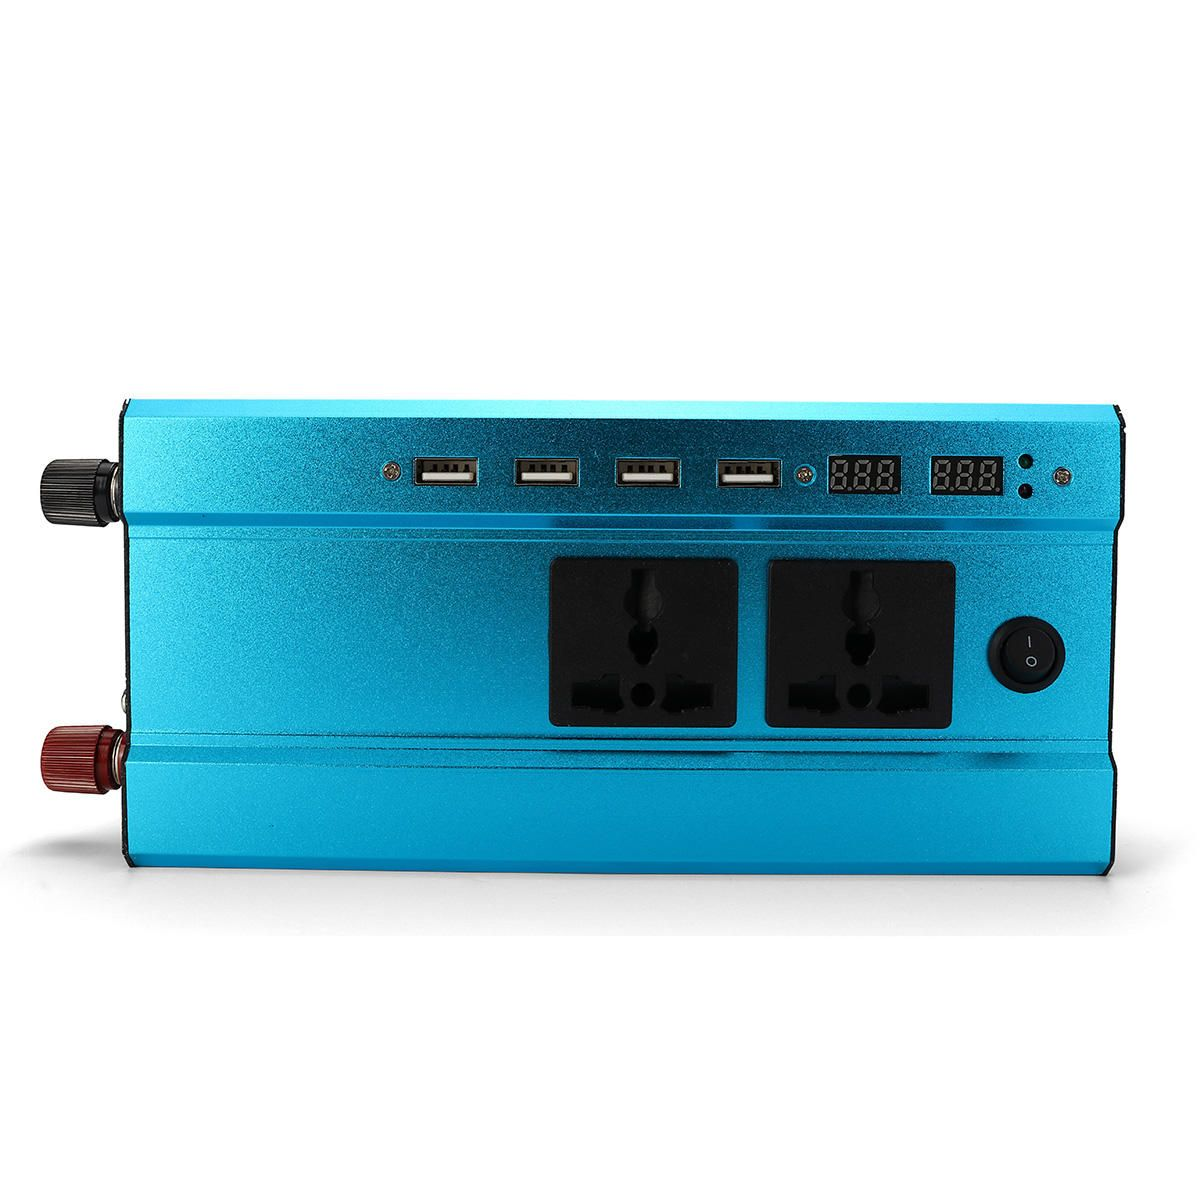 1000W/500W 4USB Interface Solar Power Inverter 12V/24V DC to 220V AC Converter Charger